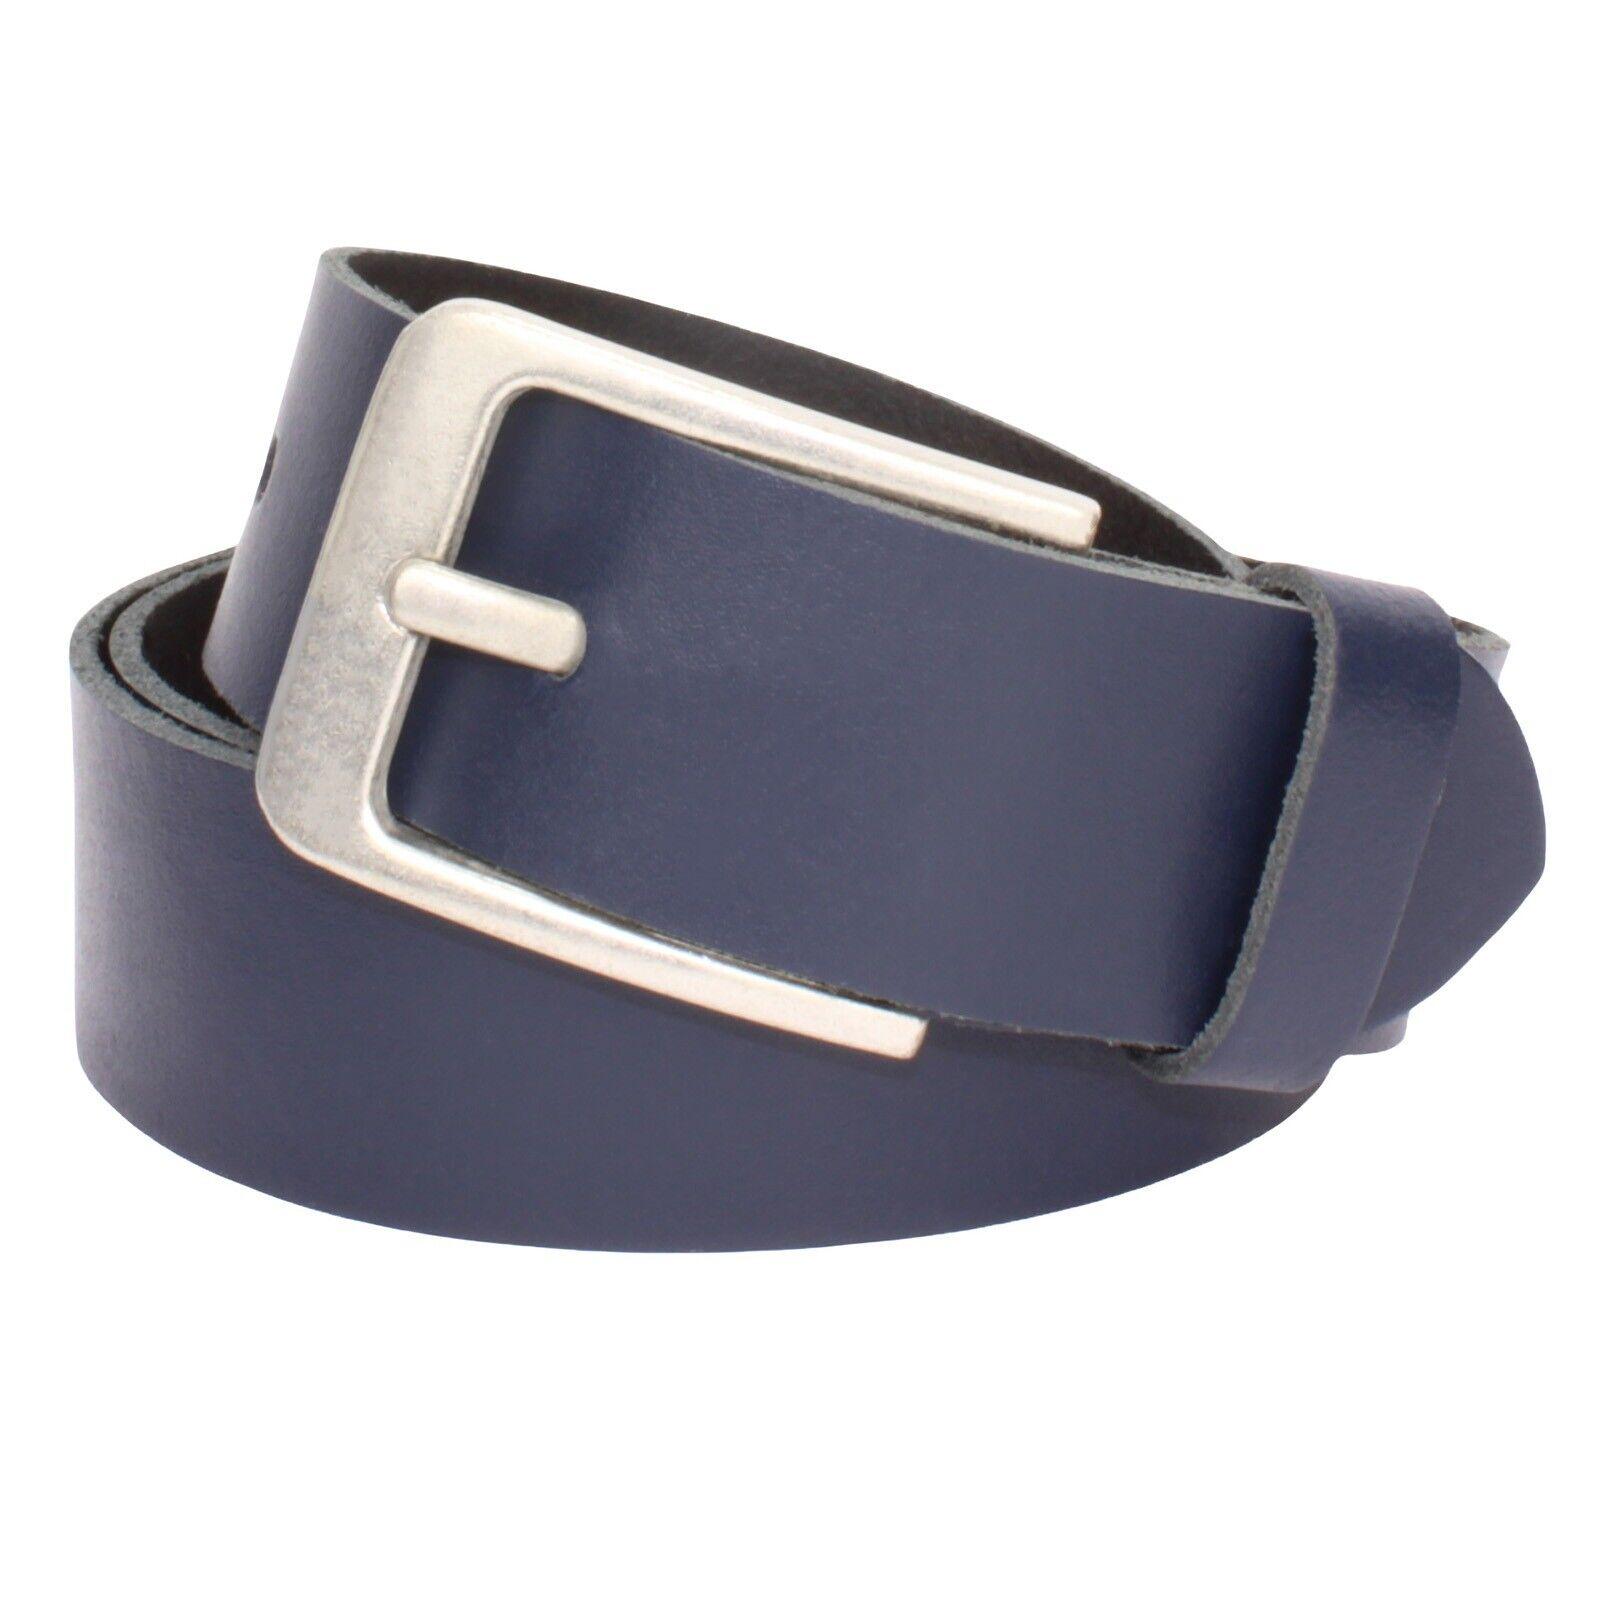 Gürtel Damen Herren Blau Rindleder 4cm Breit Ledergürtel 100% echt Leder Neu